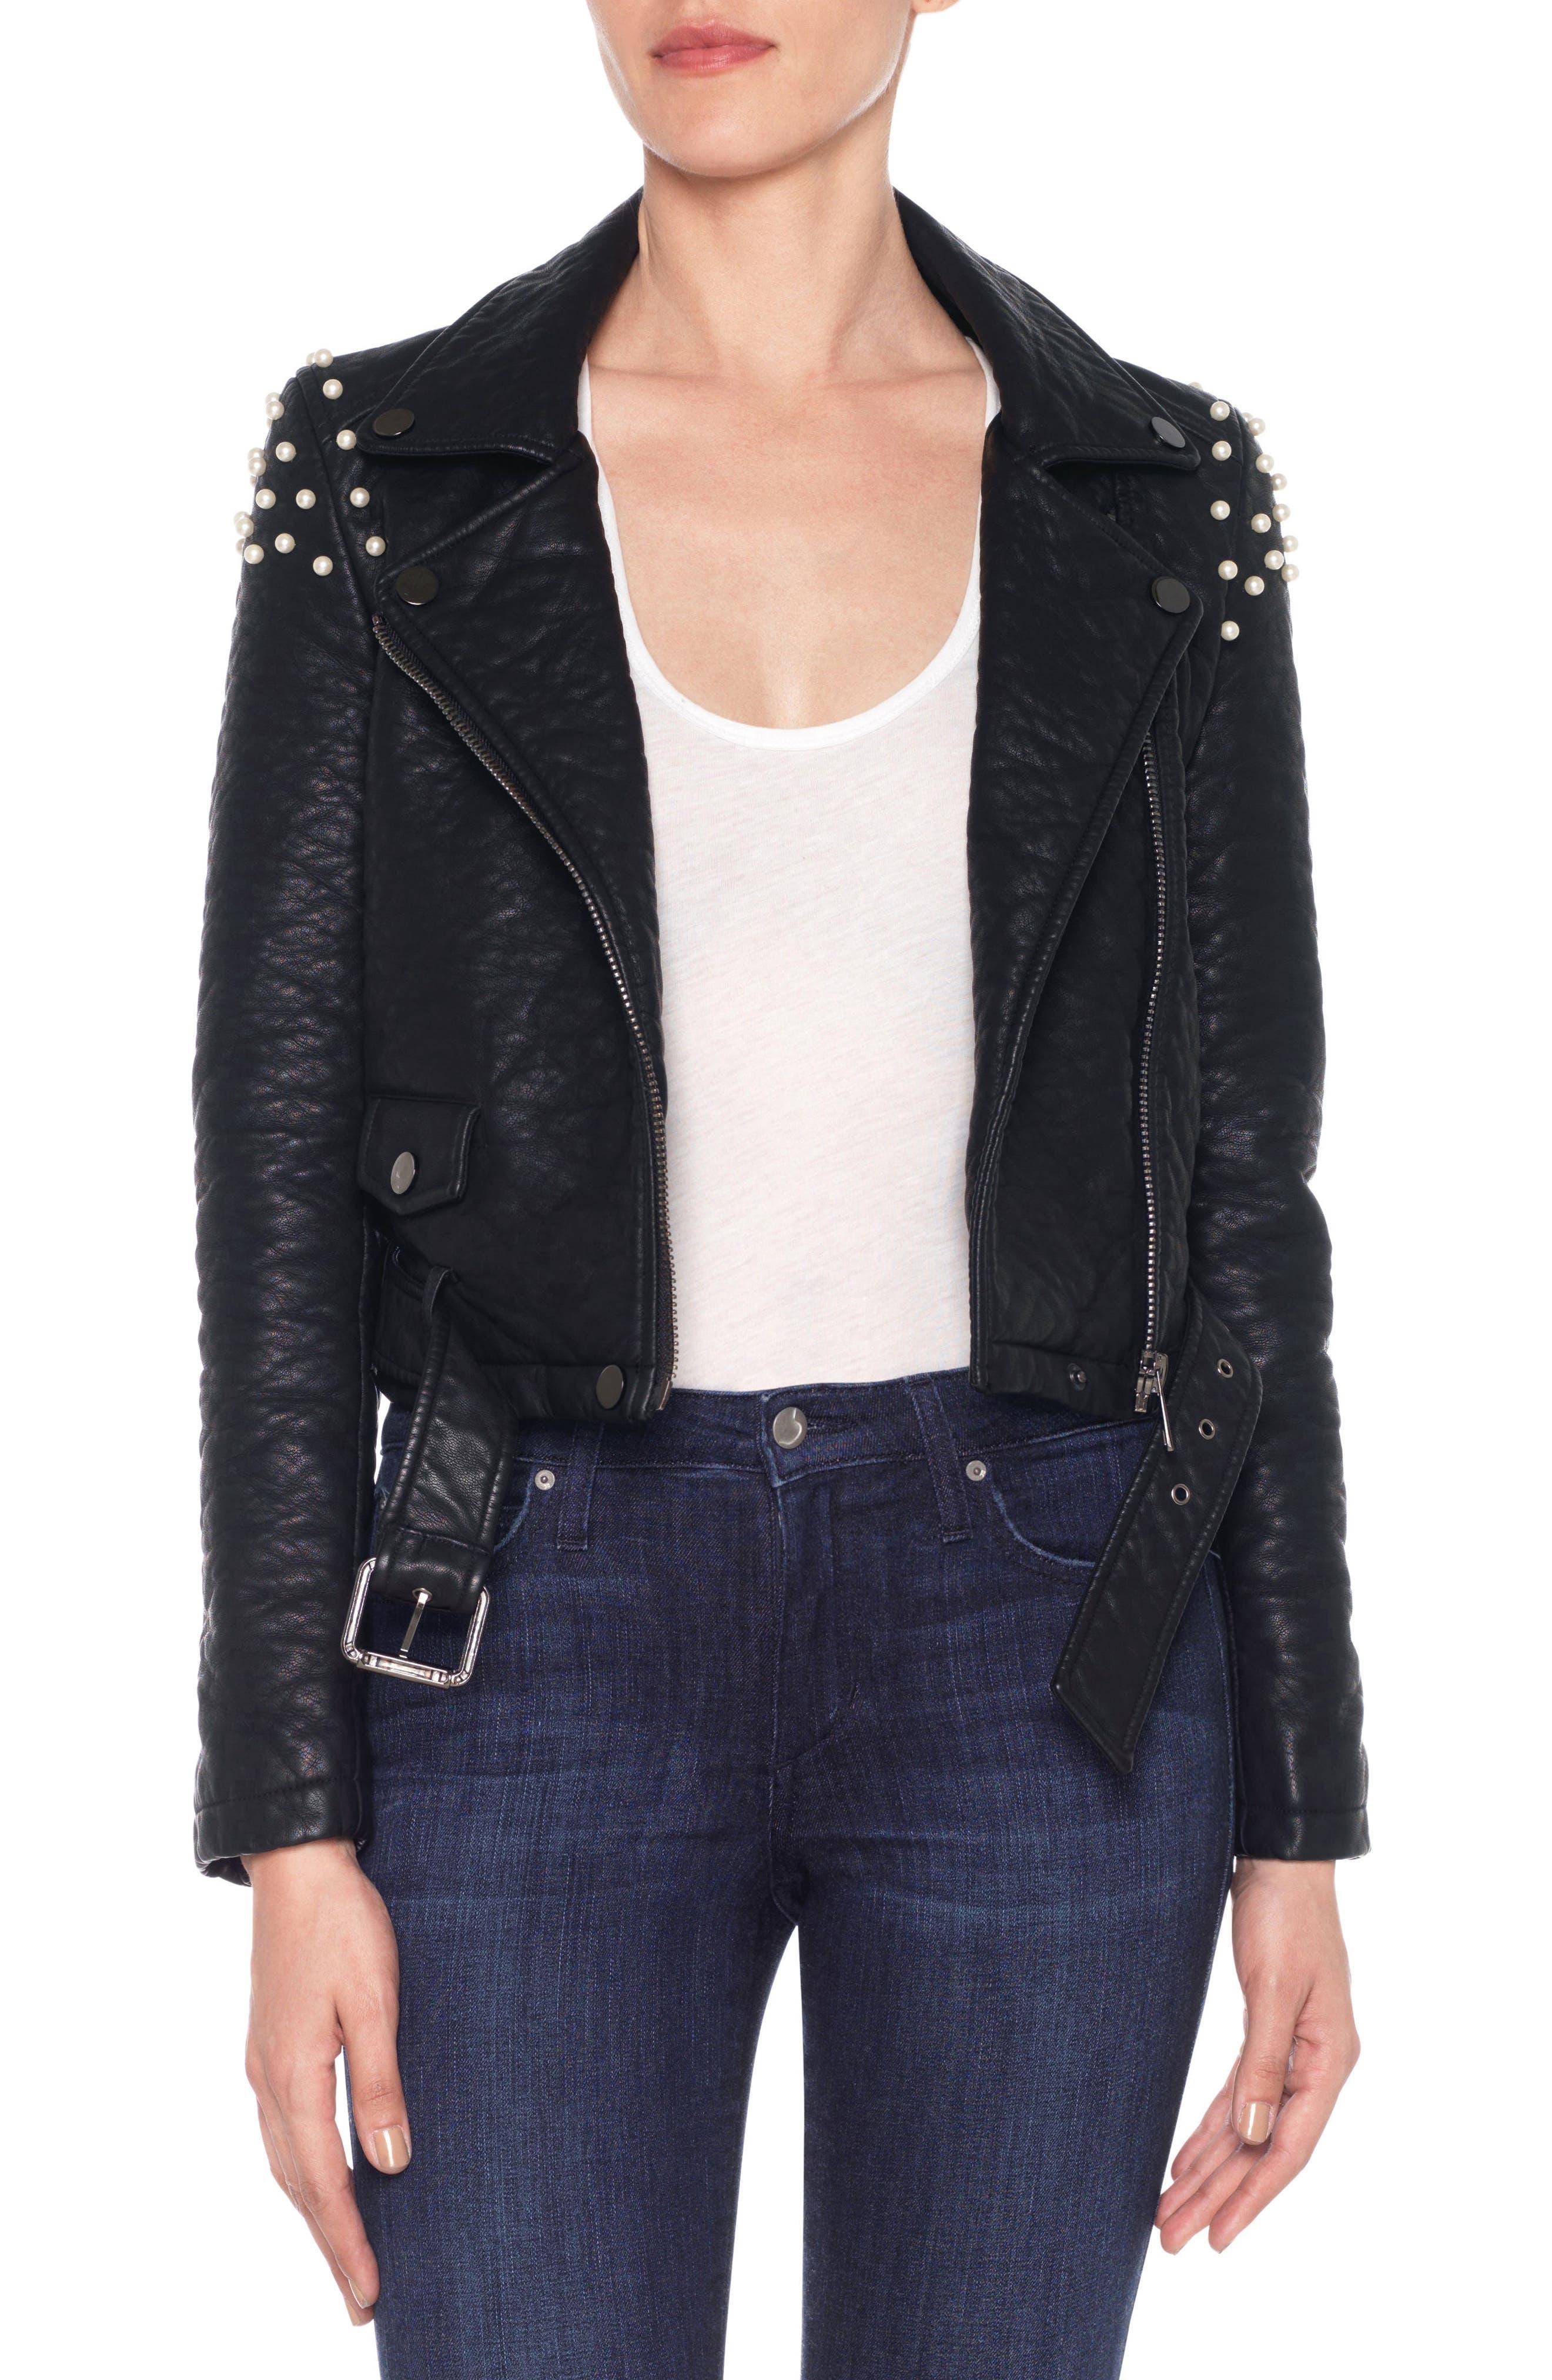 Alternate Image 1 Selected - Joe's Taylor Embellished Faux Leather Moto Jacket